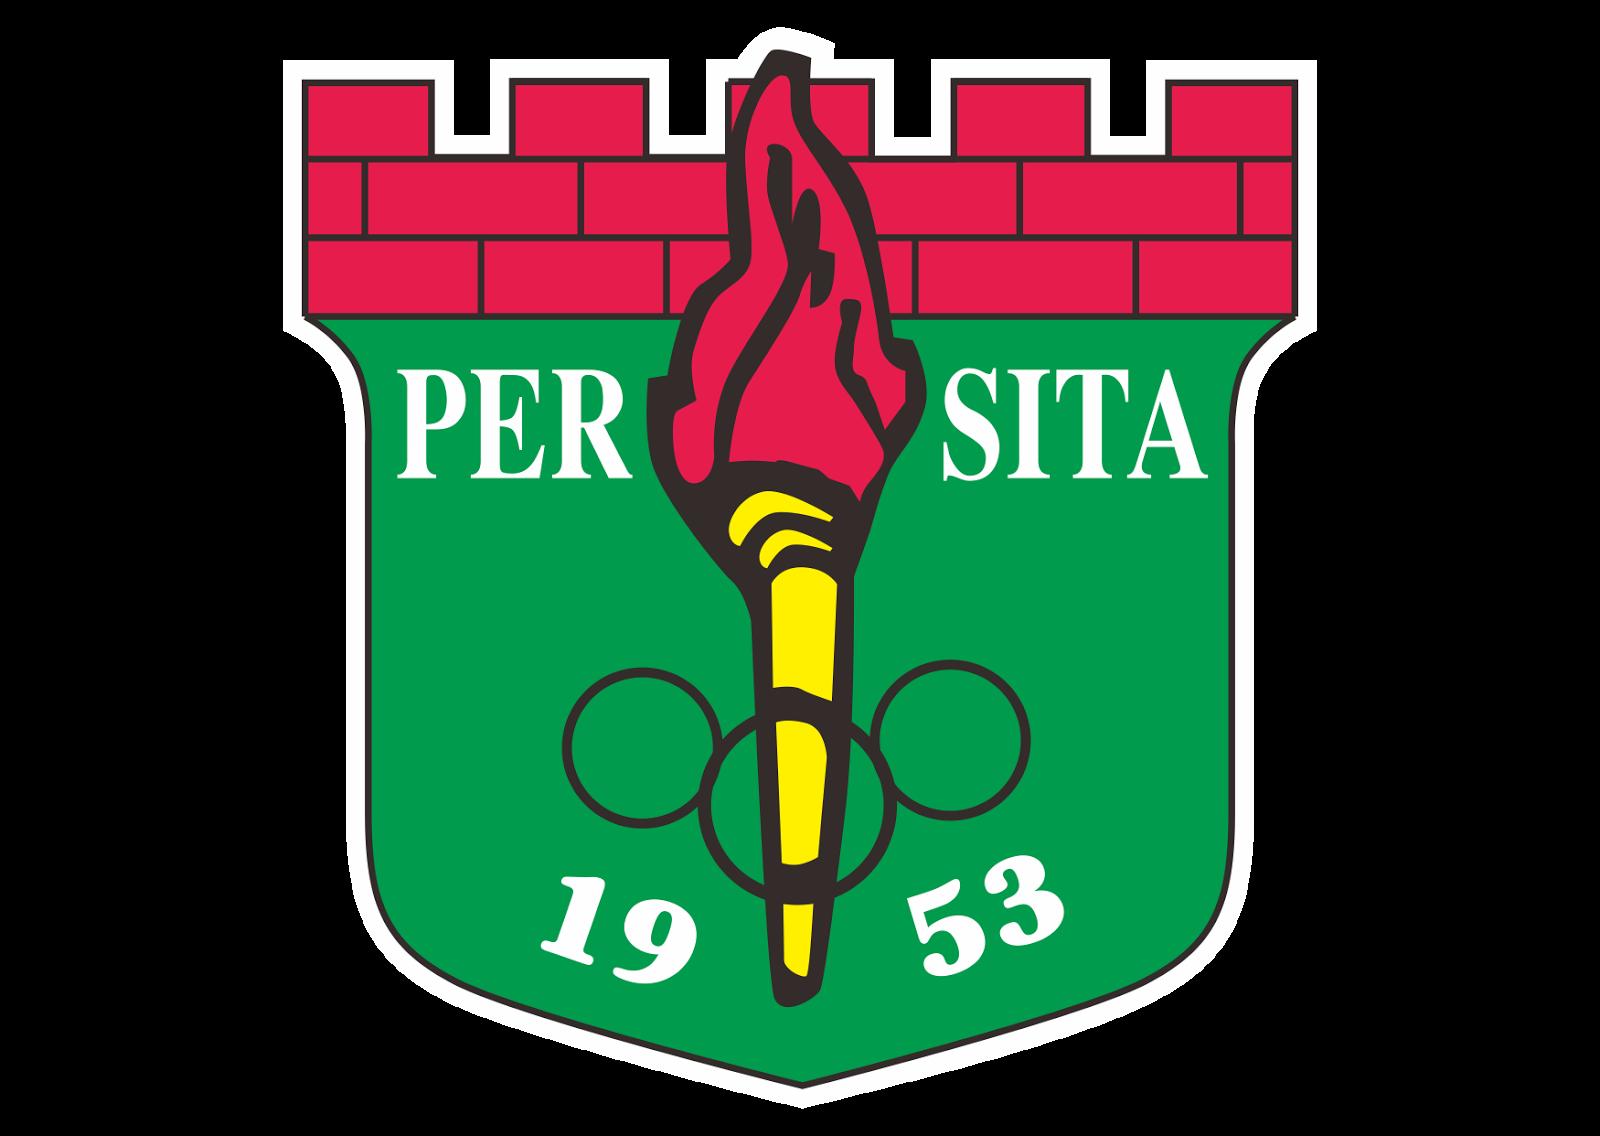 Persita logo